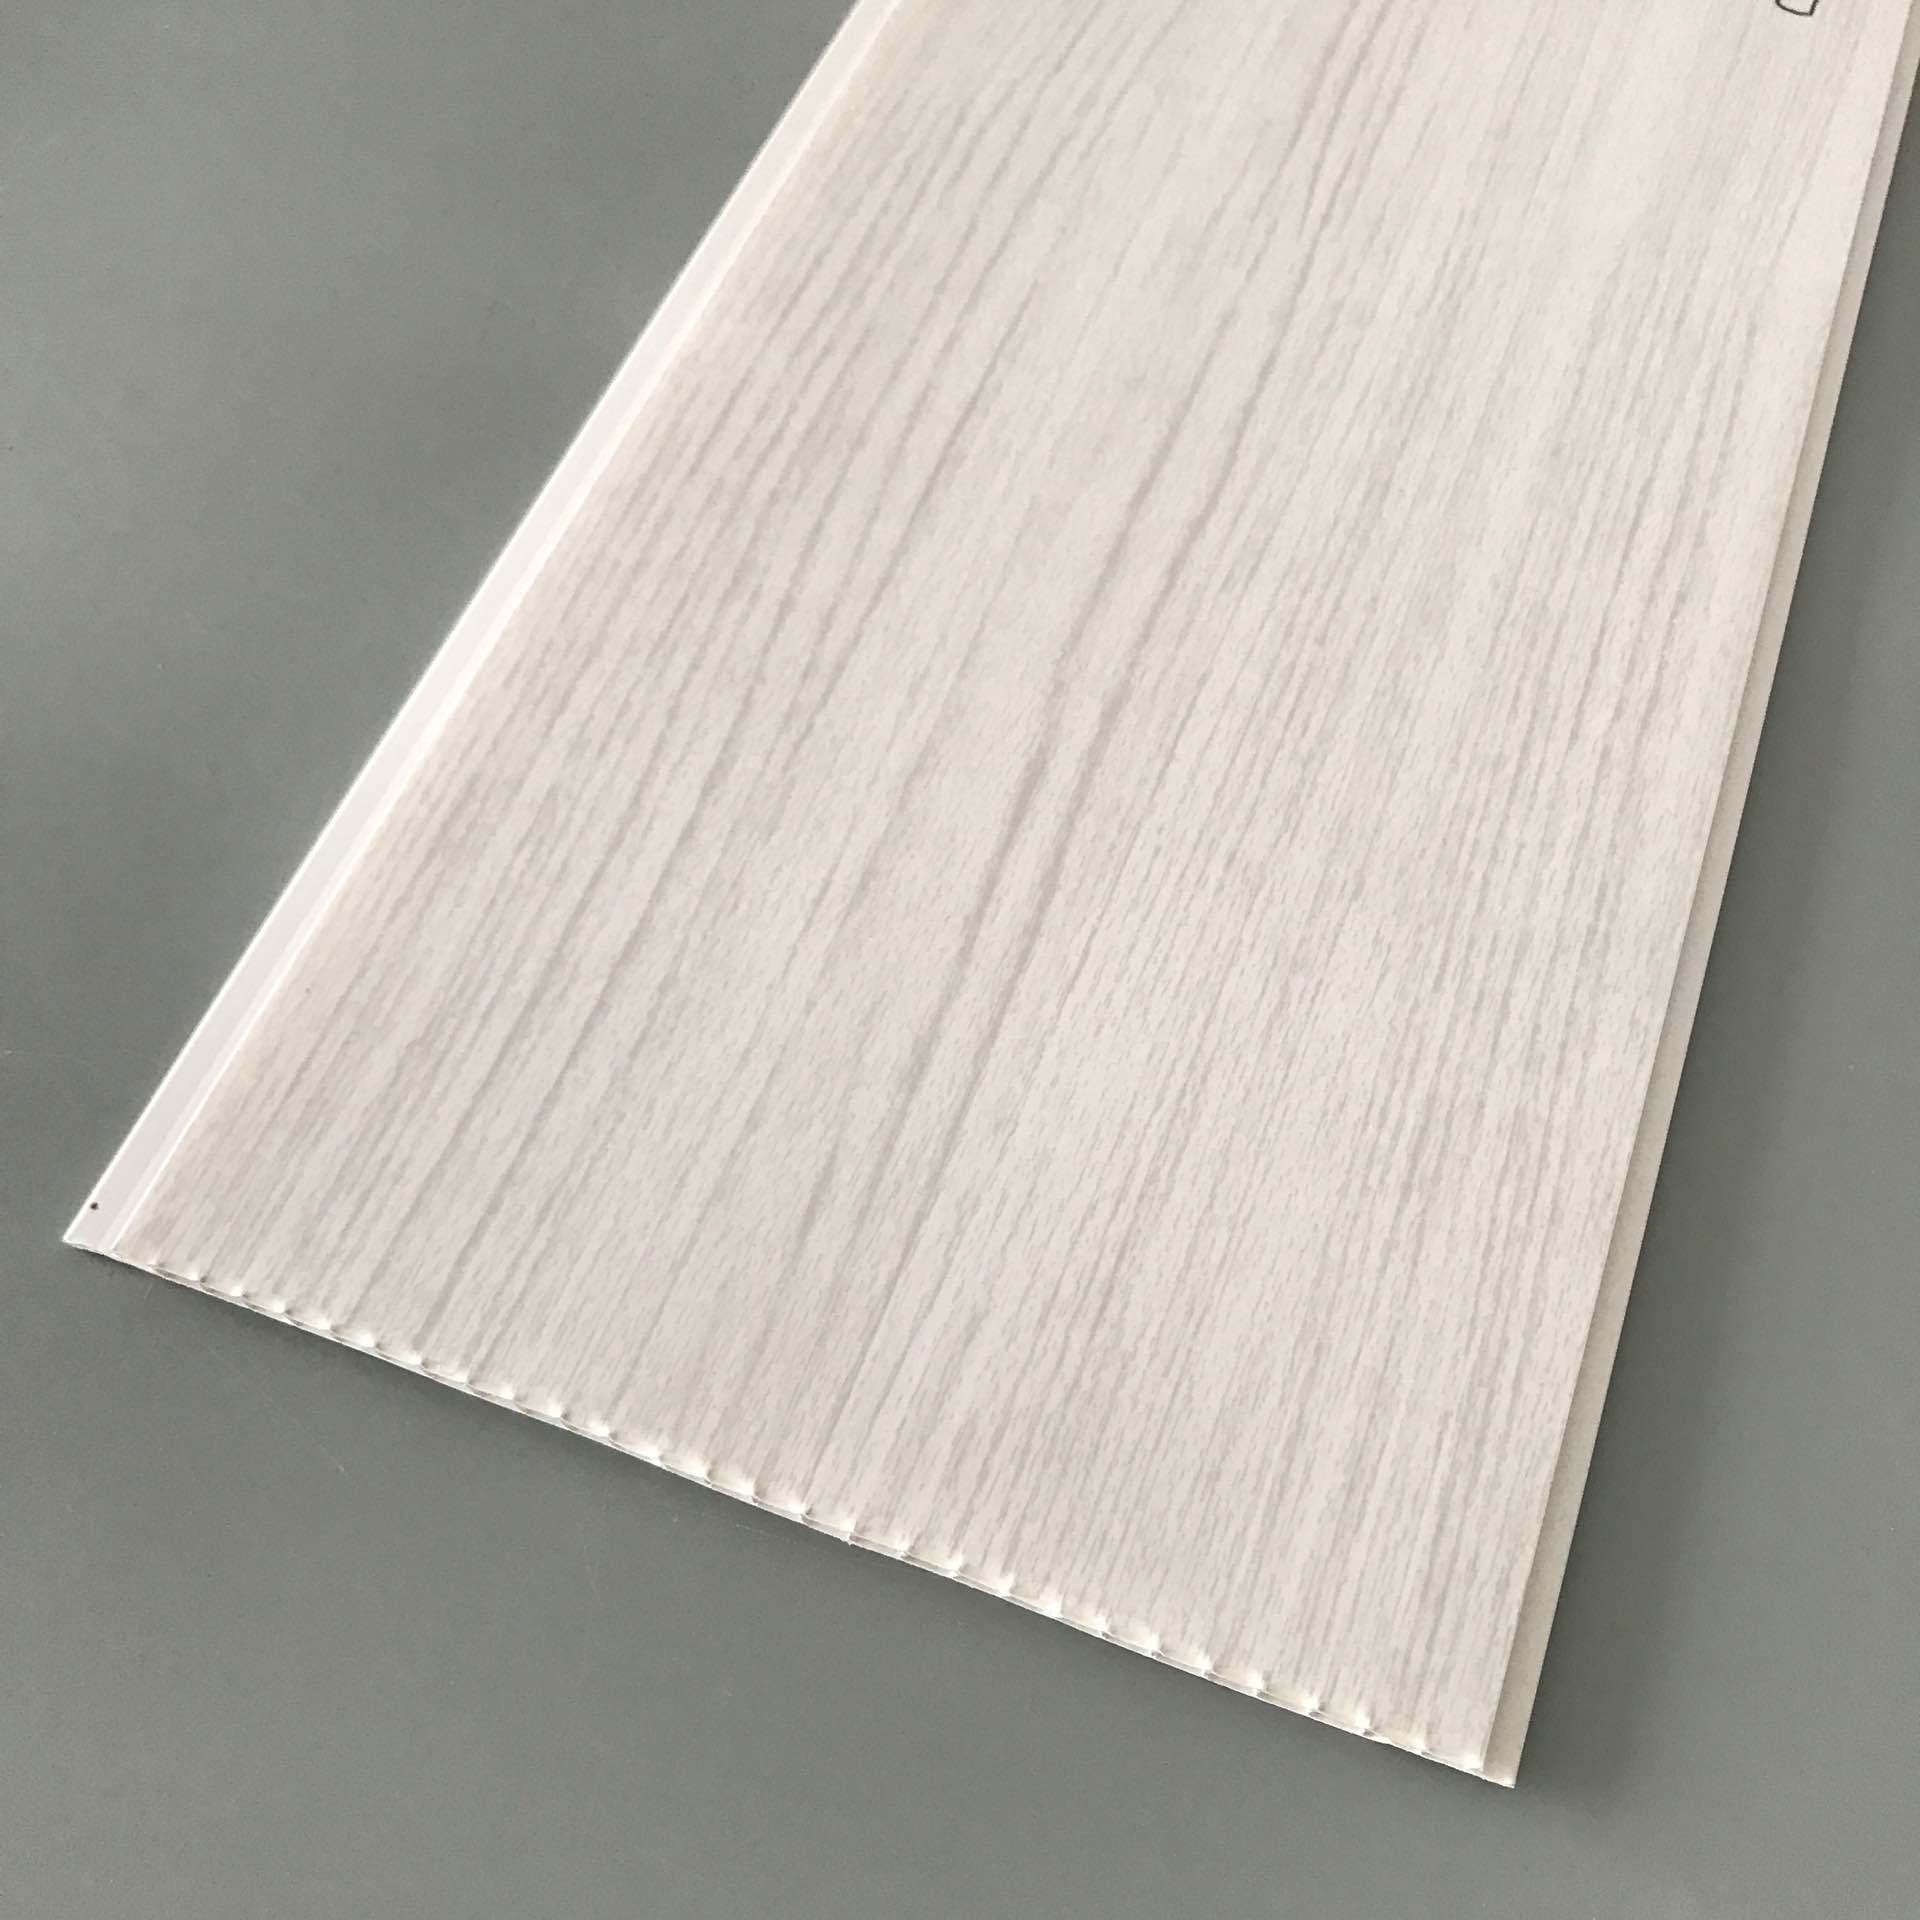 China Environmental Ceiling Pvc Panels For S Supermarkets 2 5kg 3 0kg Panel